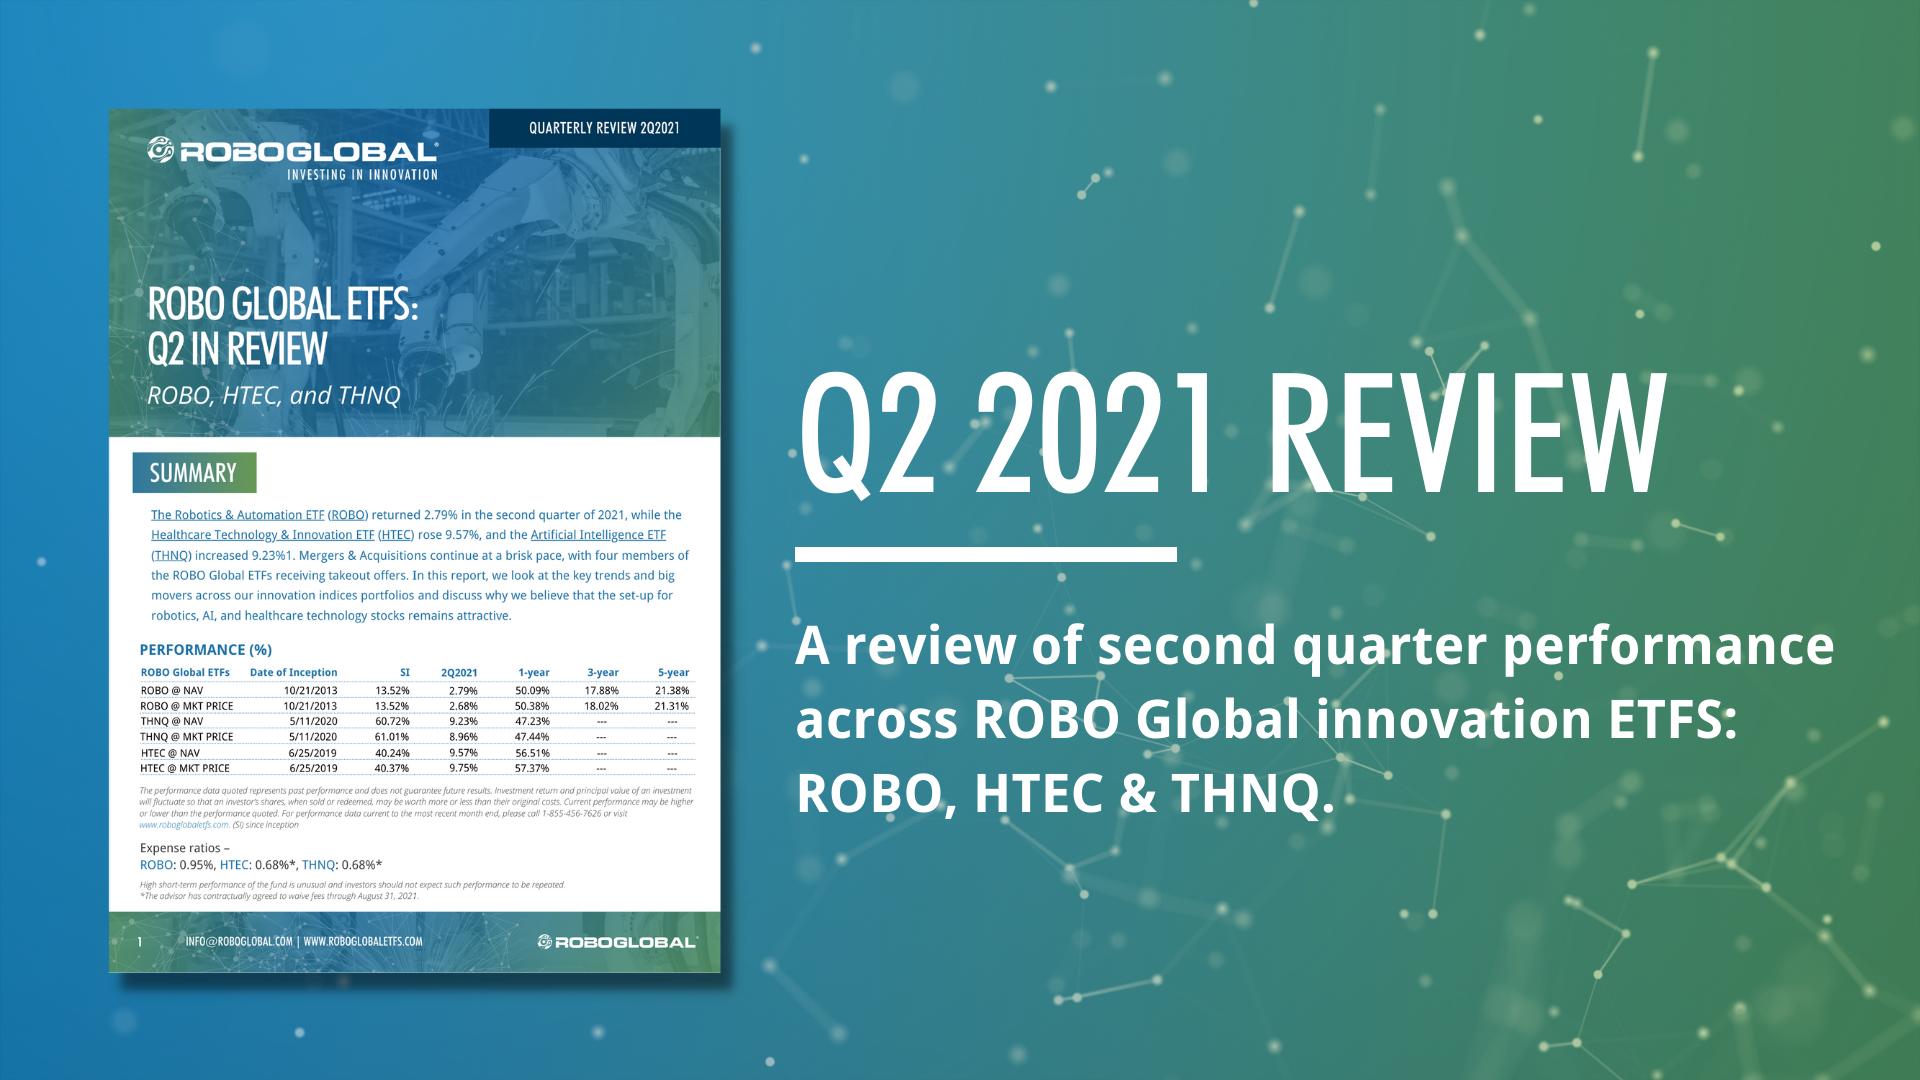 ROBO Global ETFs: Q2 2021 in Review